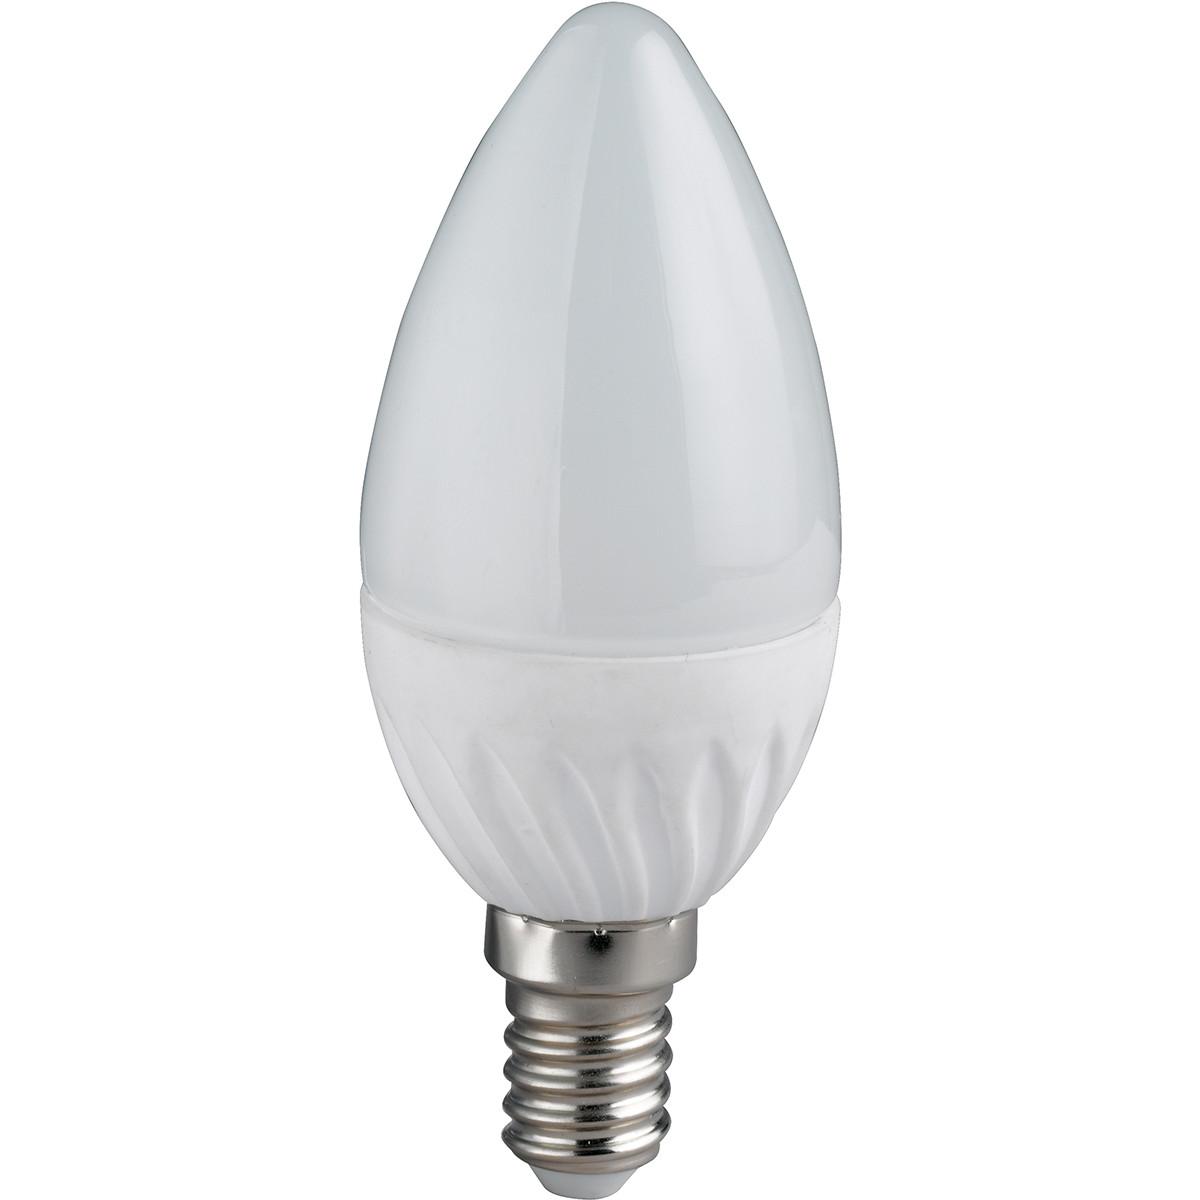 LED Lamp WiZ - Smart LED - Trion Akusti - E14 Fitting - 5W - Slimme LED - Dimbaa